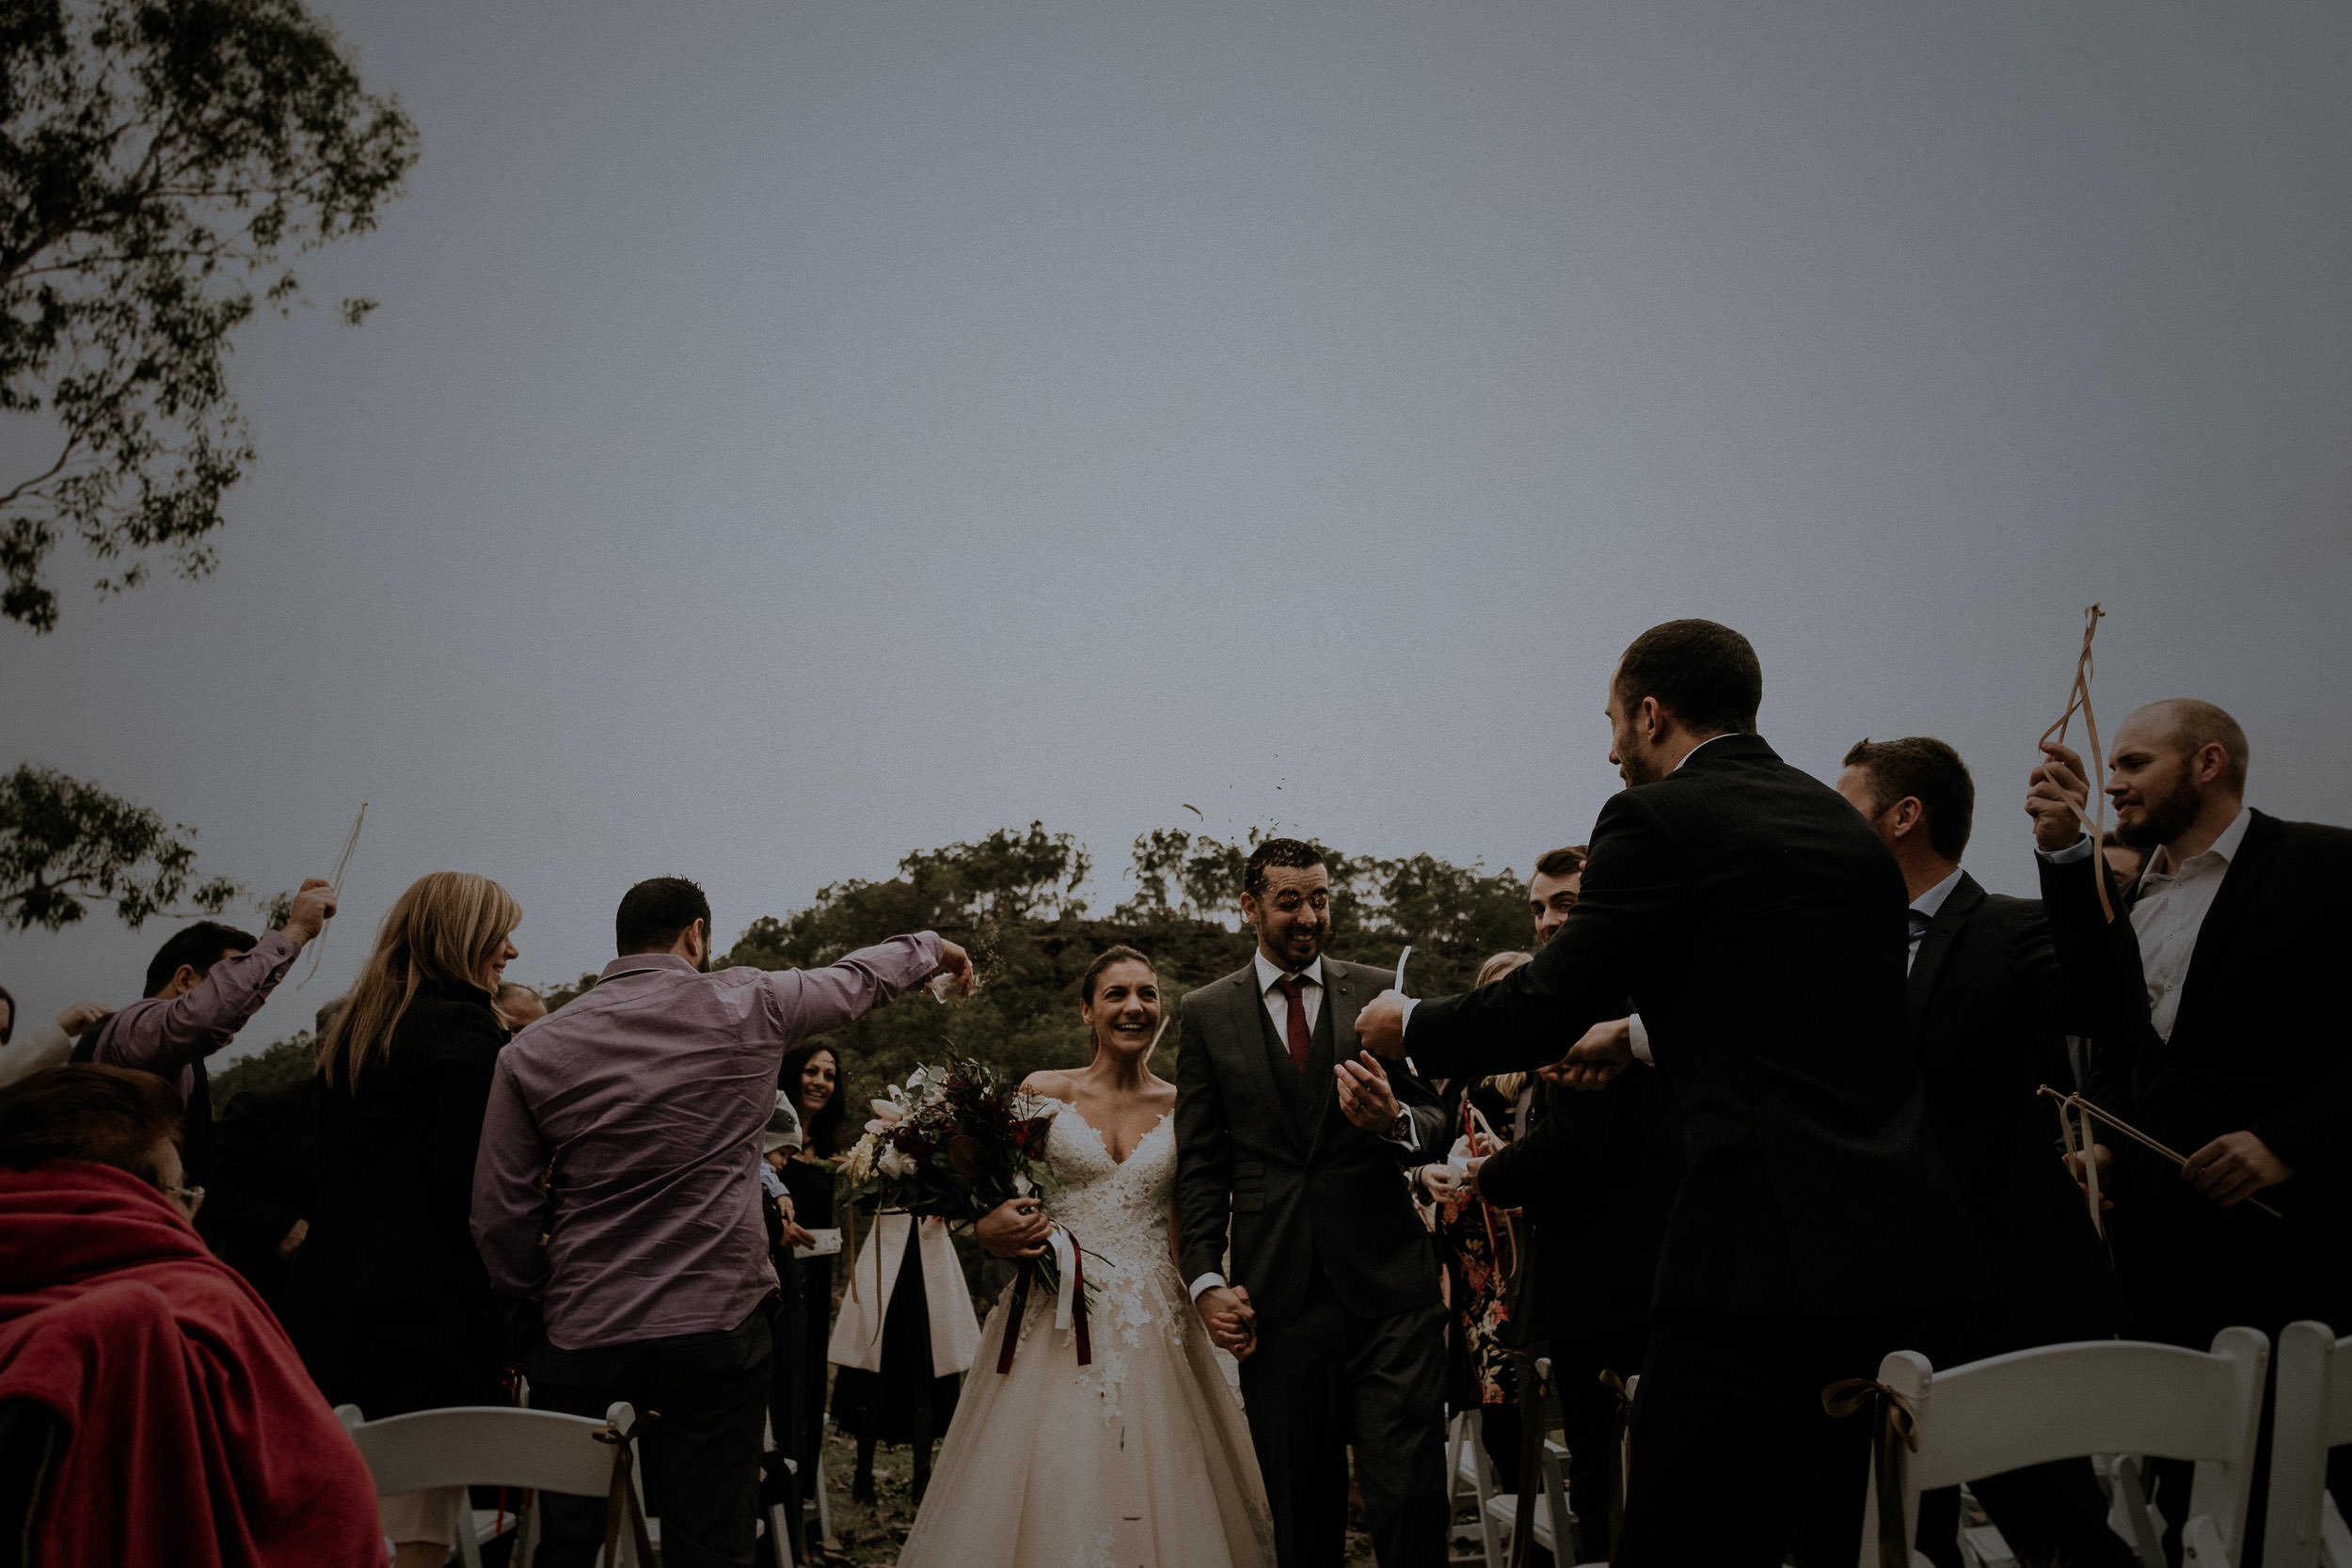 g_c wedding - kings _ thieves elopement wedding photography - blog 56.jpg